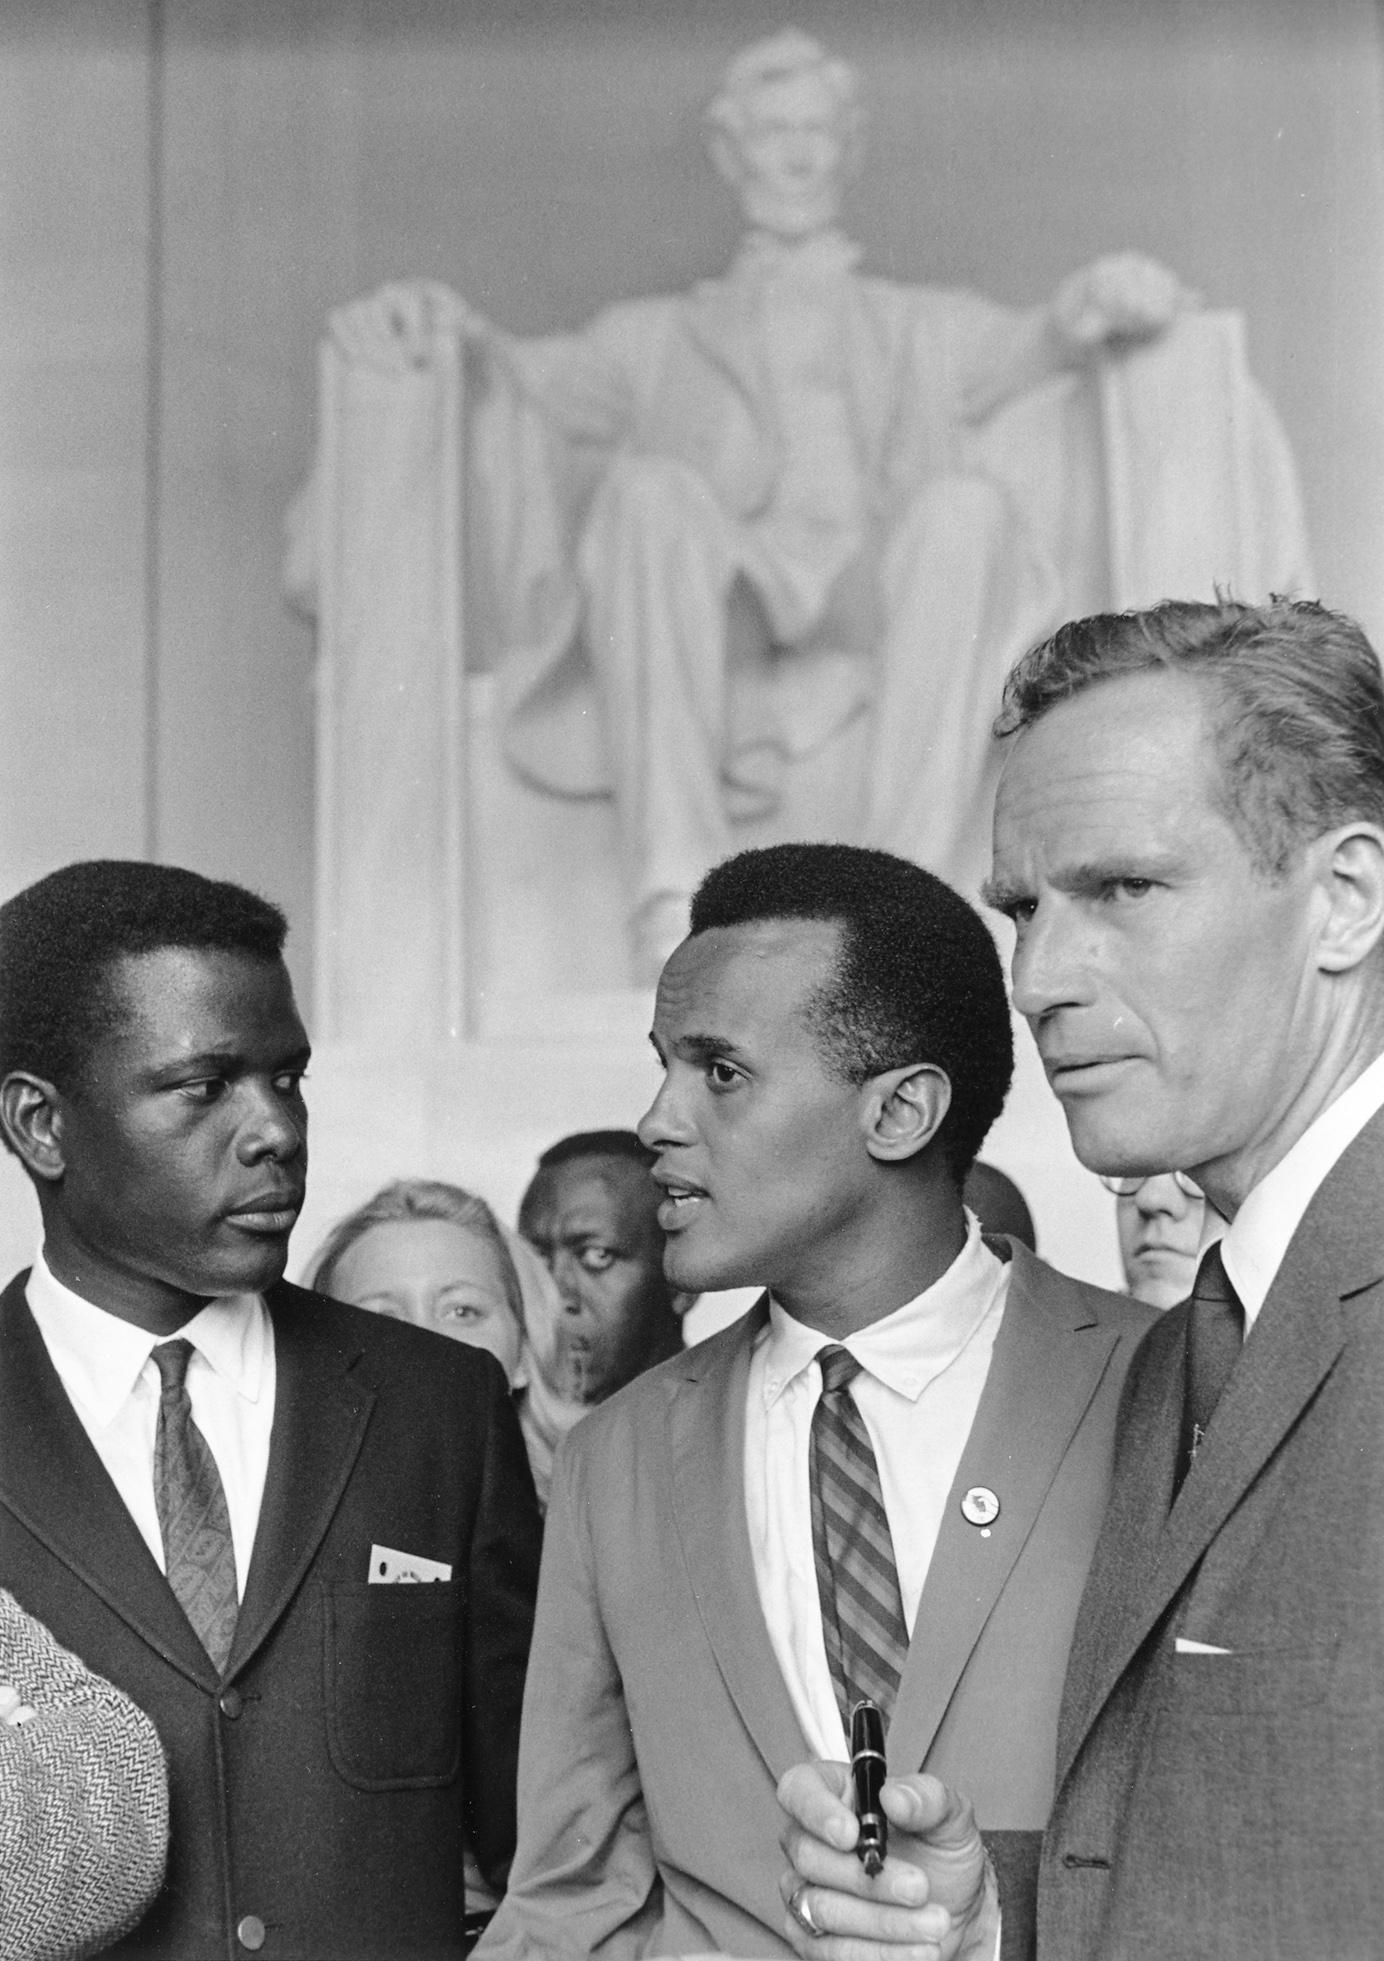 Poitier_Belafonte_Heston_Civil_Rights_March_1963_medium_square.jpg